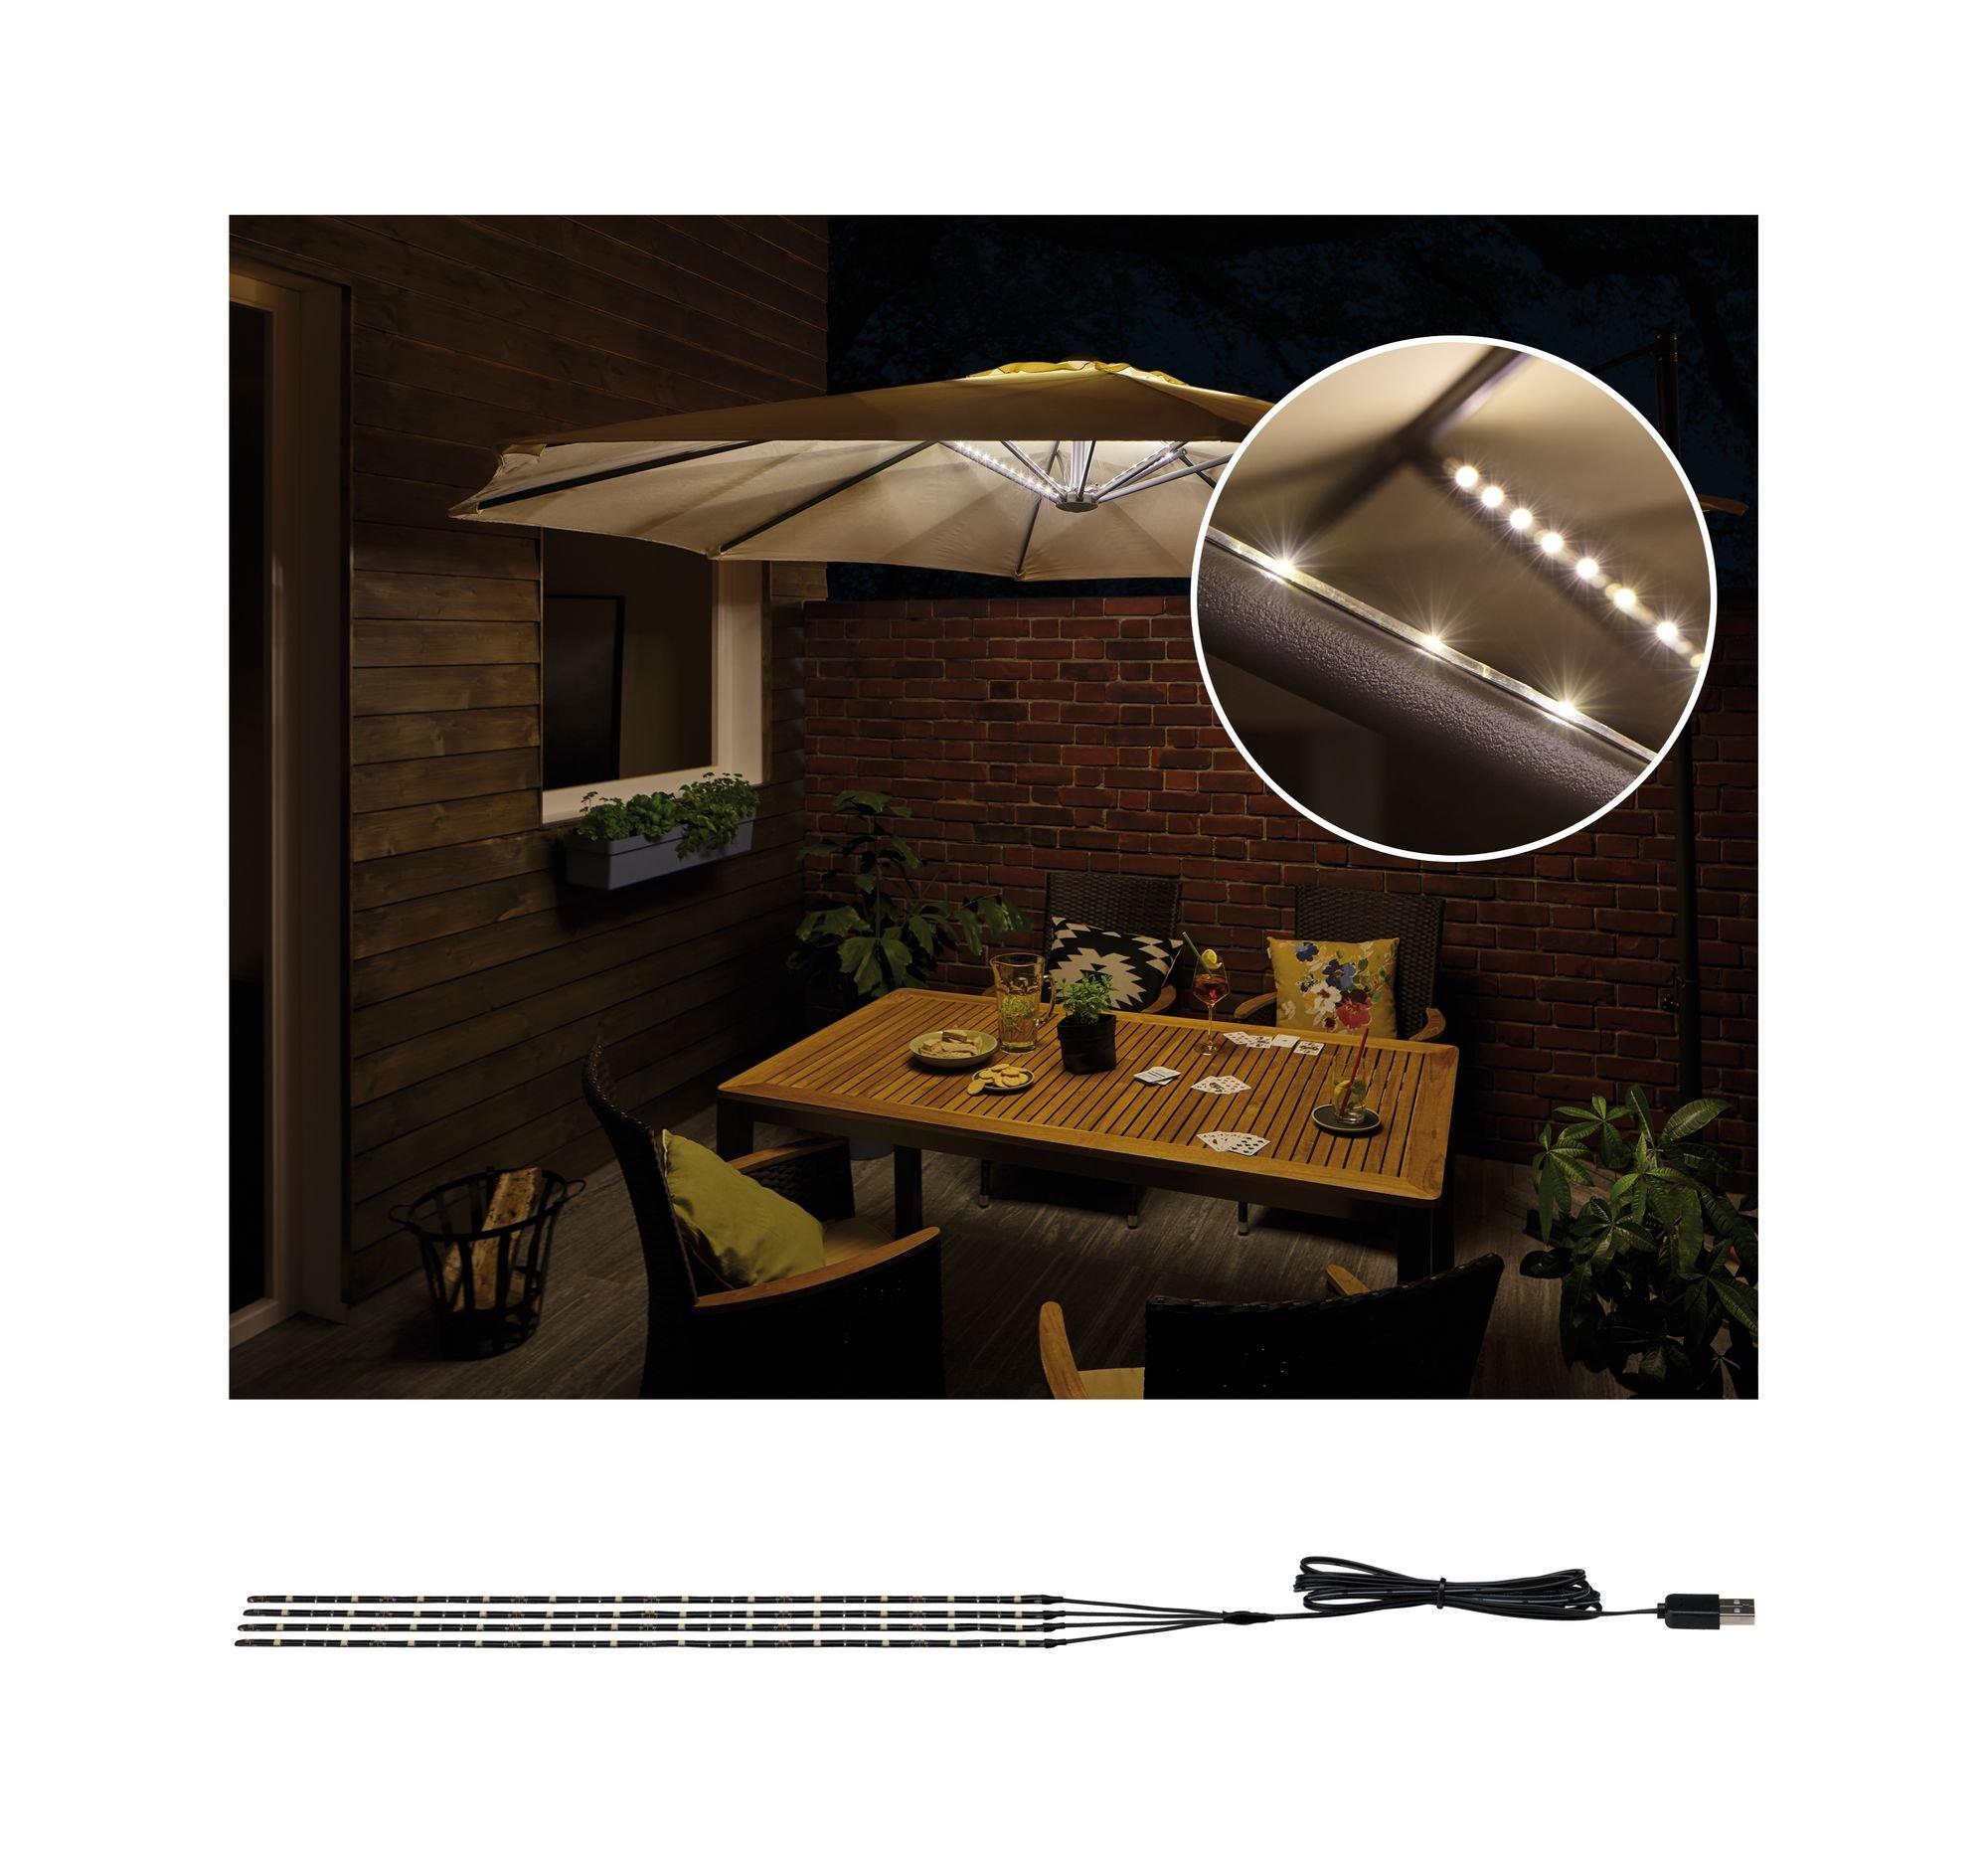 Paulmann 942.08 Outdoor Mobile Lighting IP44 3000 K 4x0,4 m, Parasol, luminaria Decorativa, Tiras de luz, Strips LED 94208, 1.8 W, Negro, 40 x 0.5 x 0.3 cm: Amazon.es: Iluminación